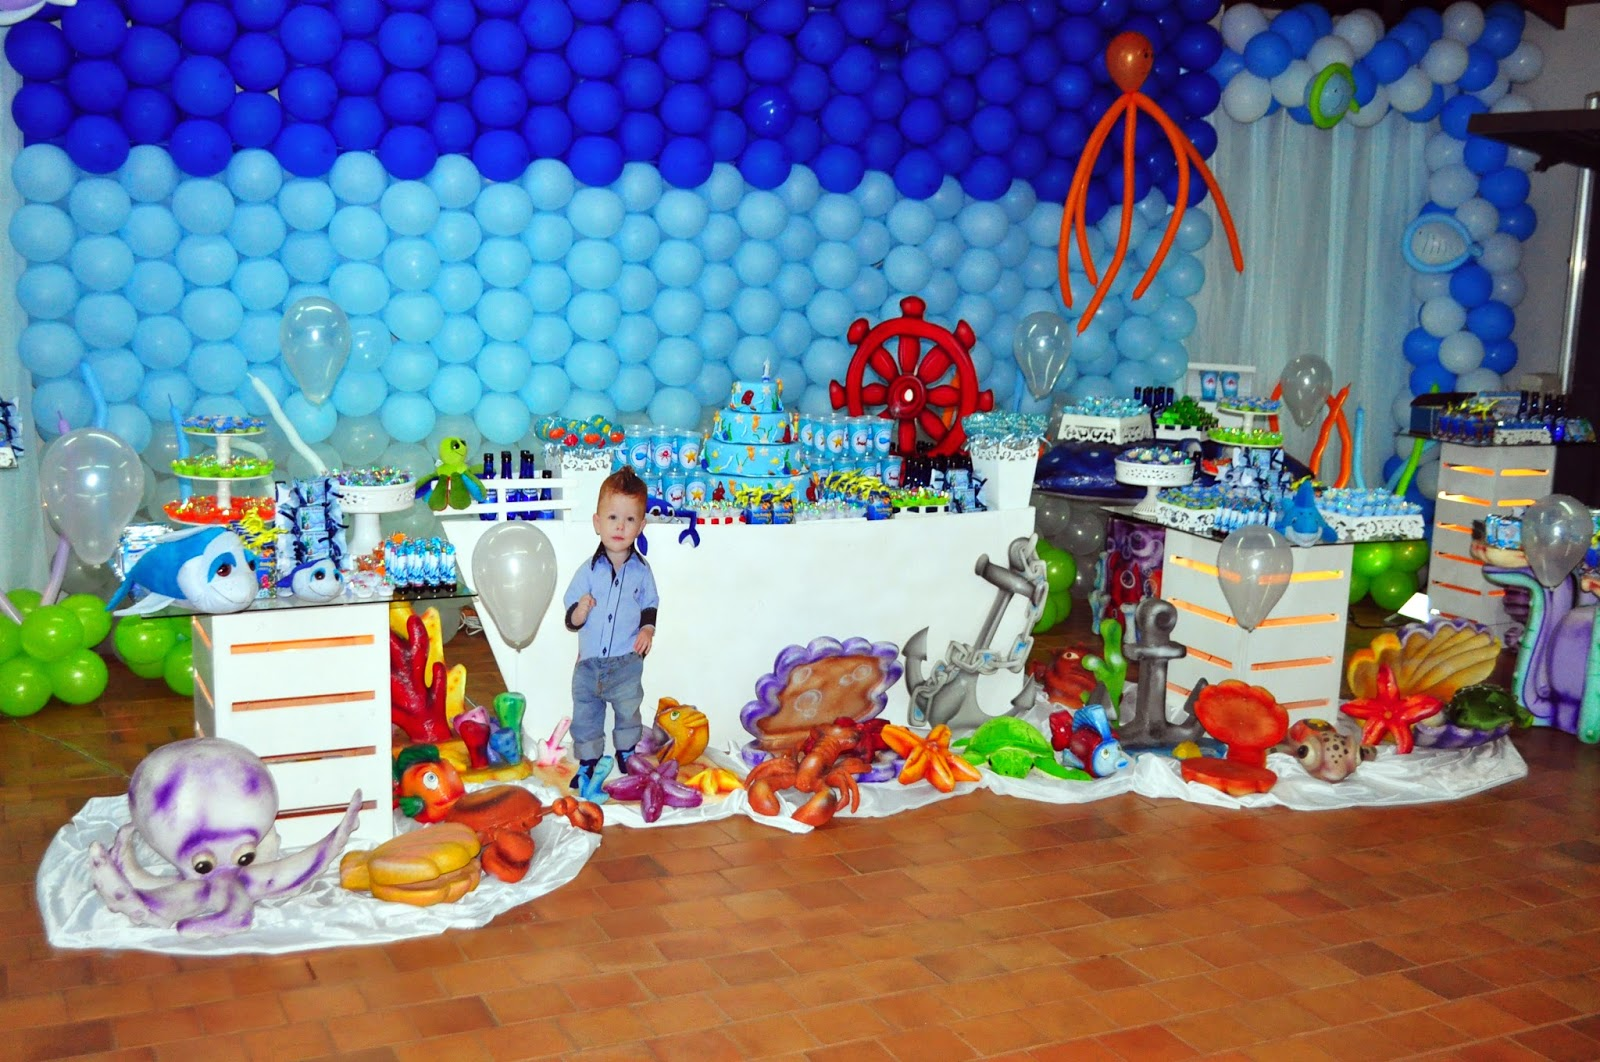 Agora n s somos festeirah decor fundo do mar proven al for Agora decoration